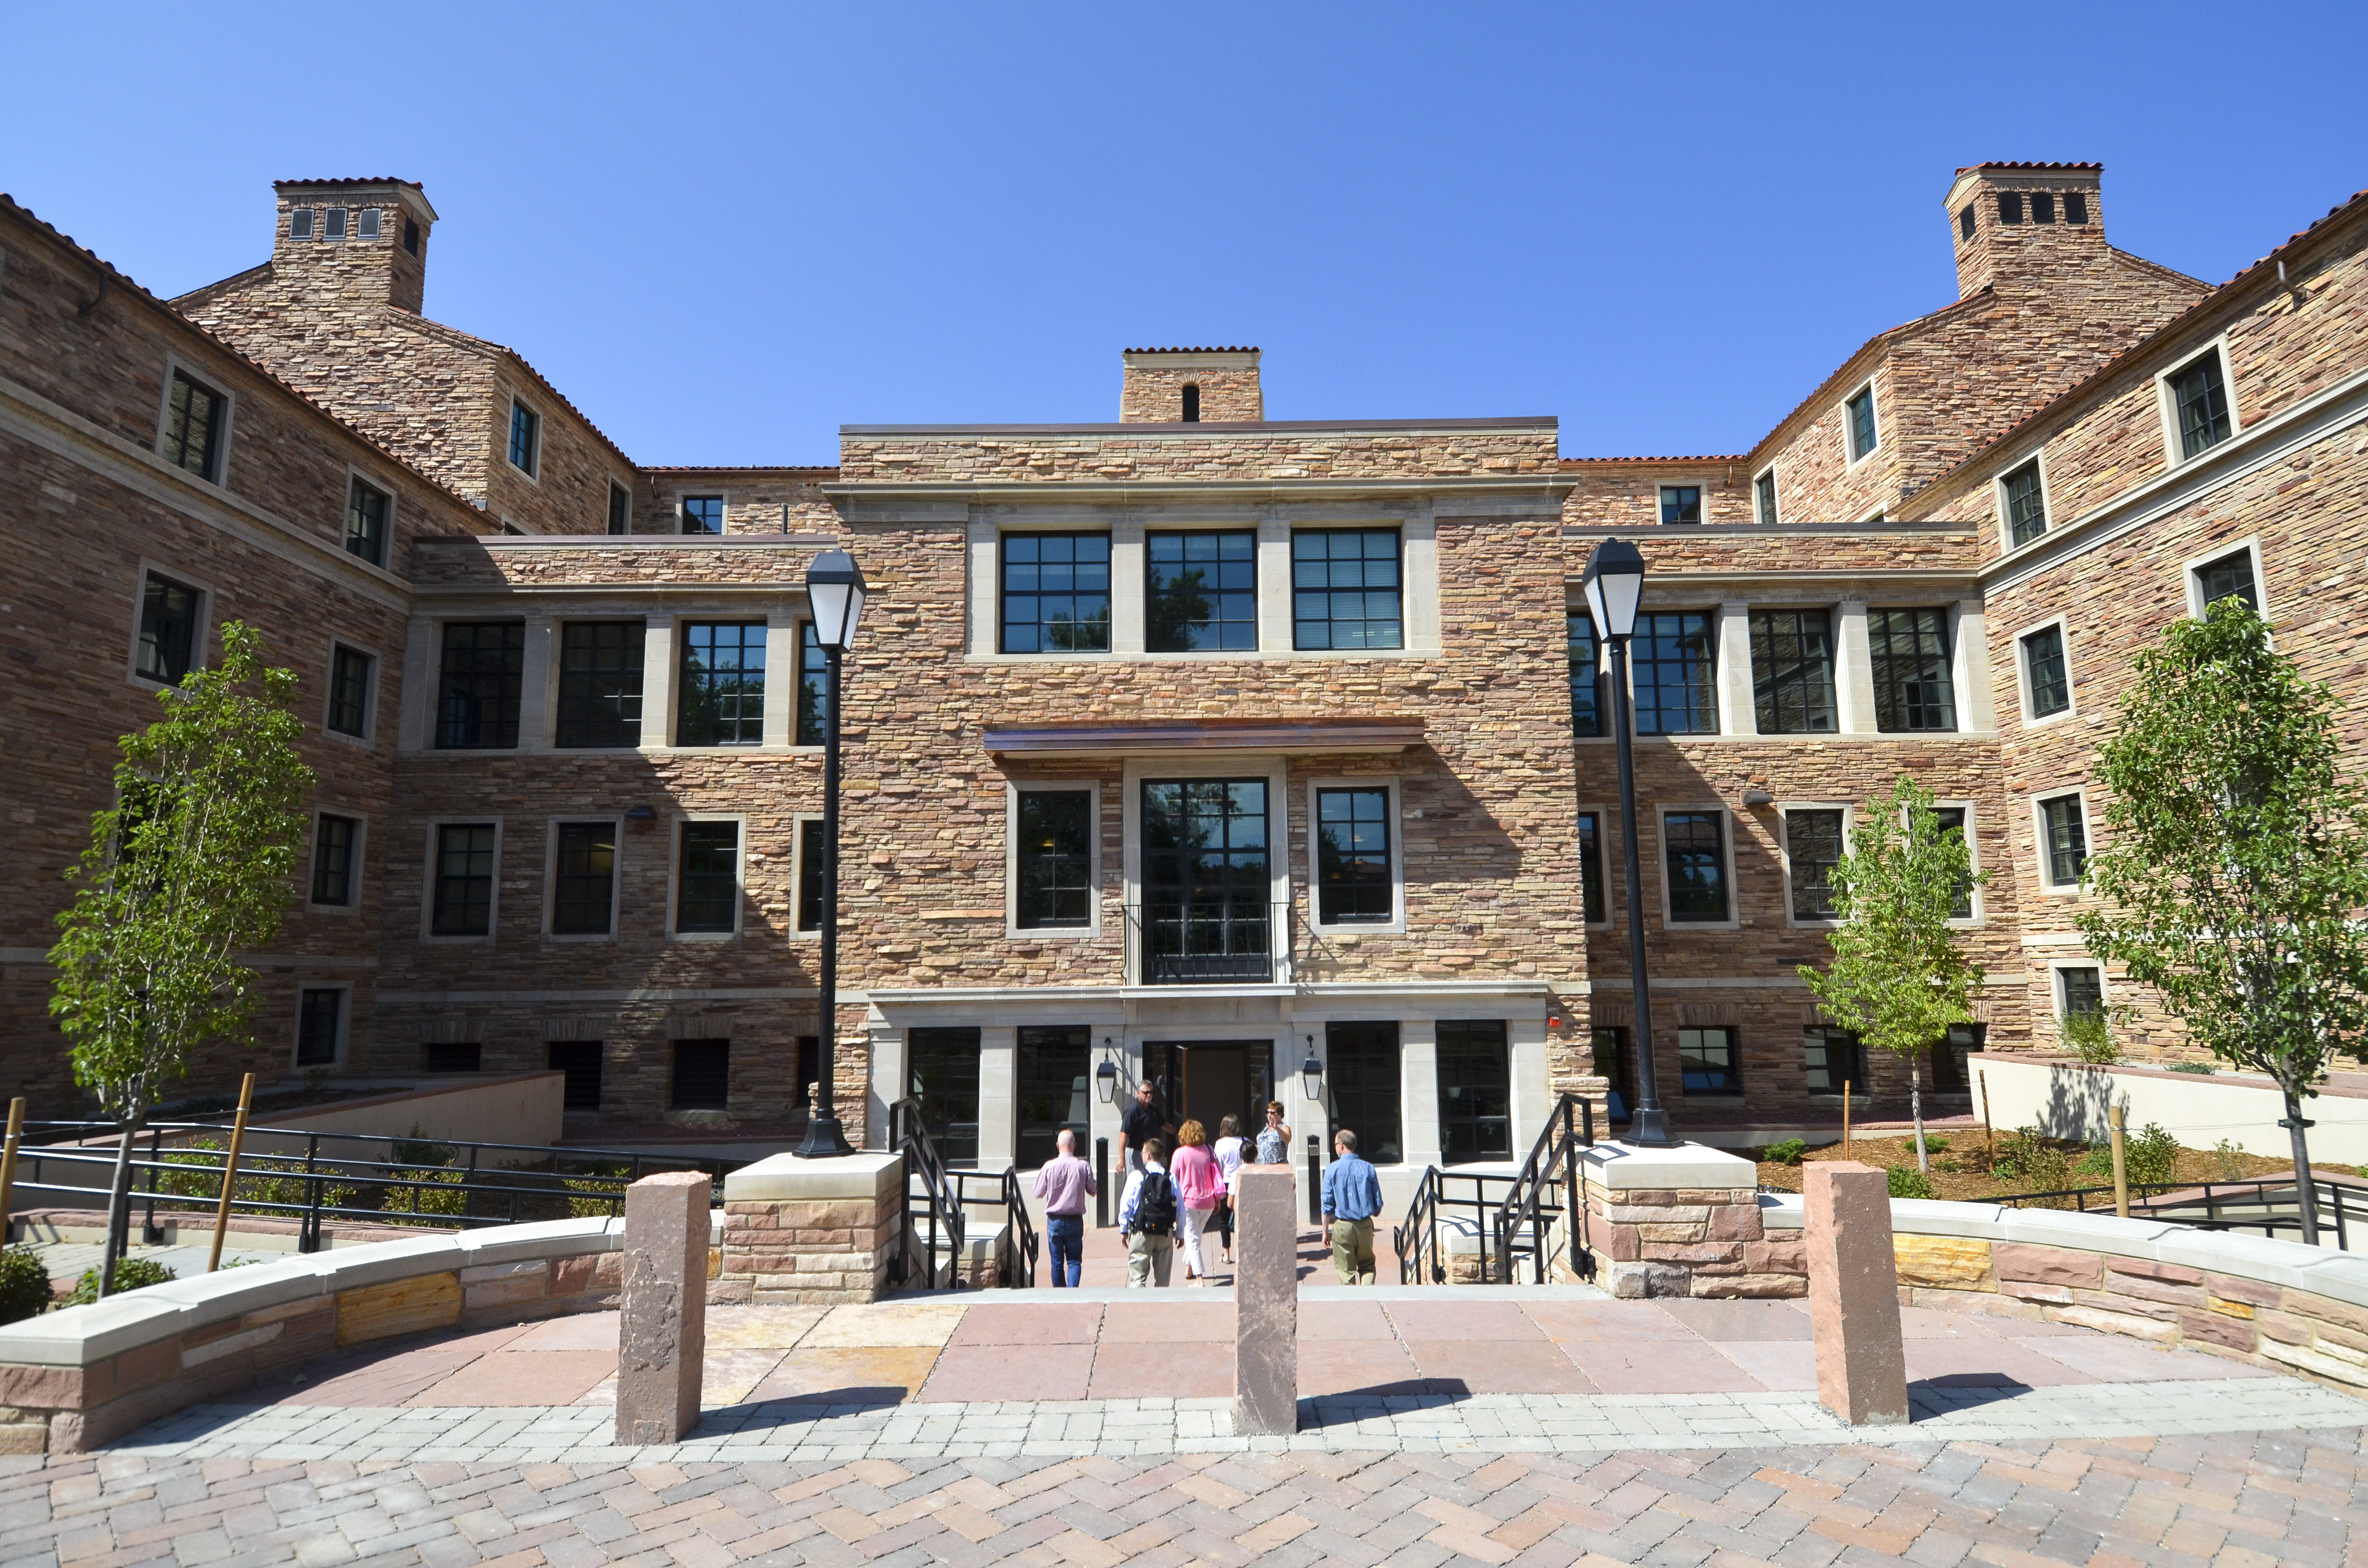 Patrick Campbell—University of Colorado–Boulder